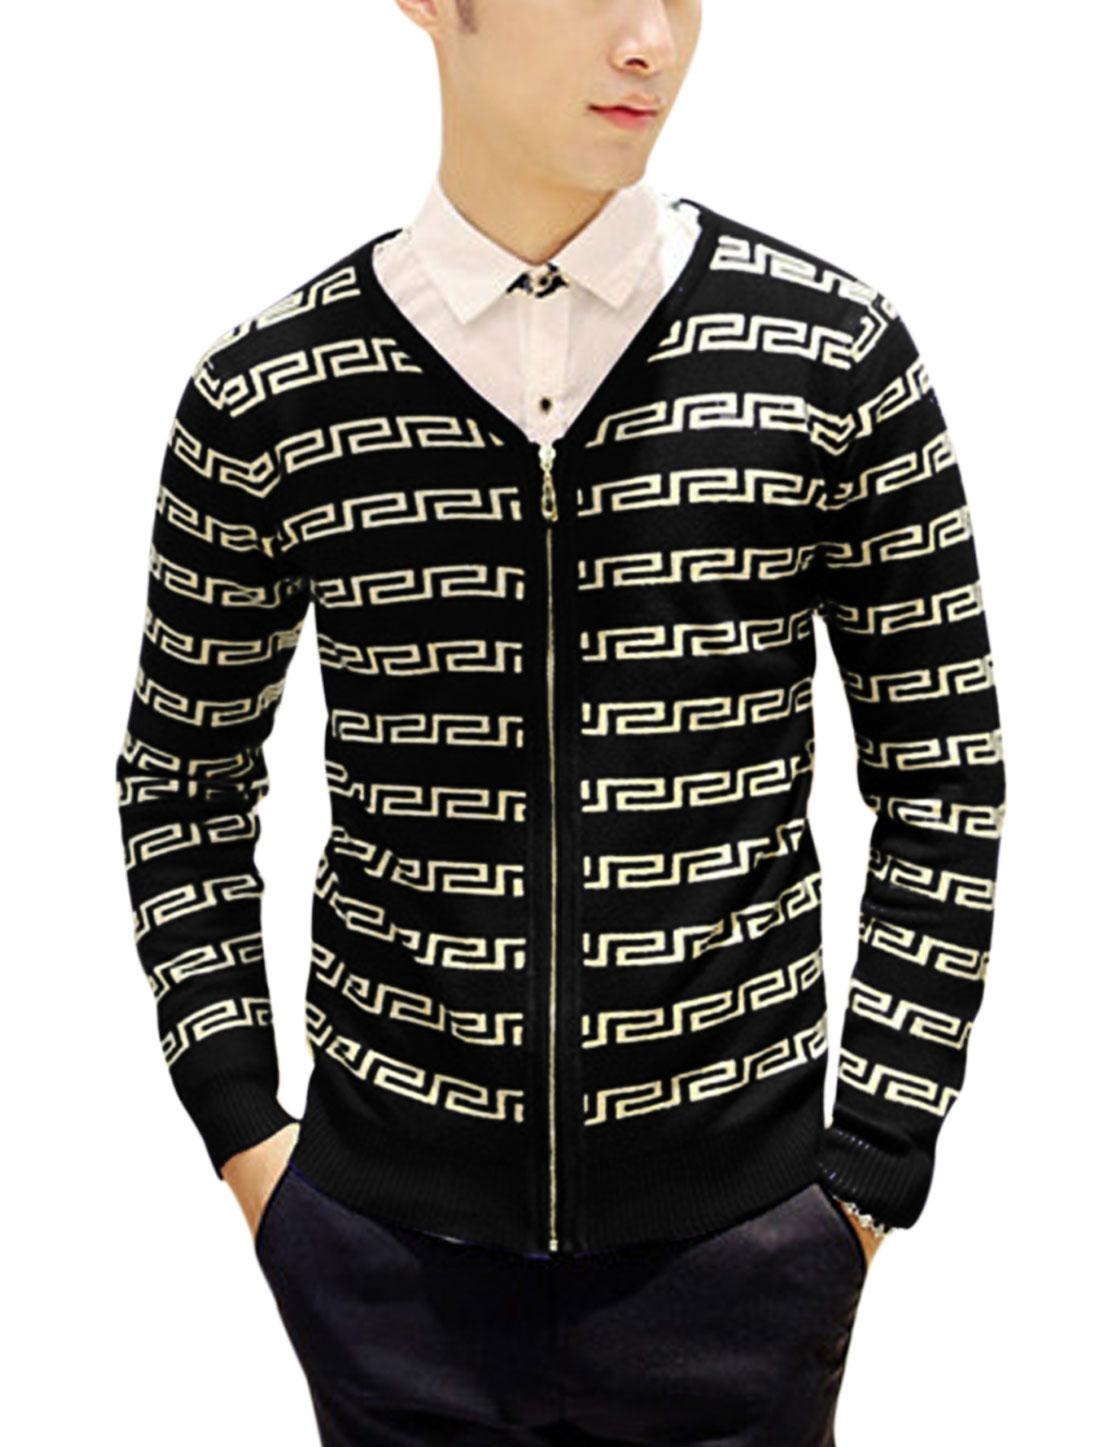 Man Black Long Sleeves V Neck Zip Closure Round Neck Cardigan S